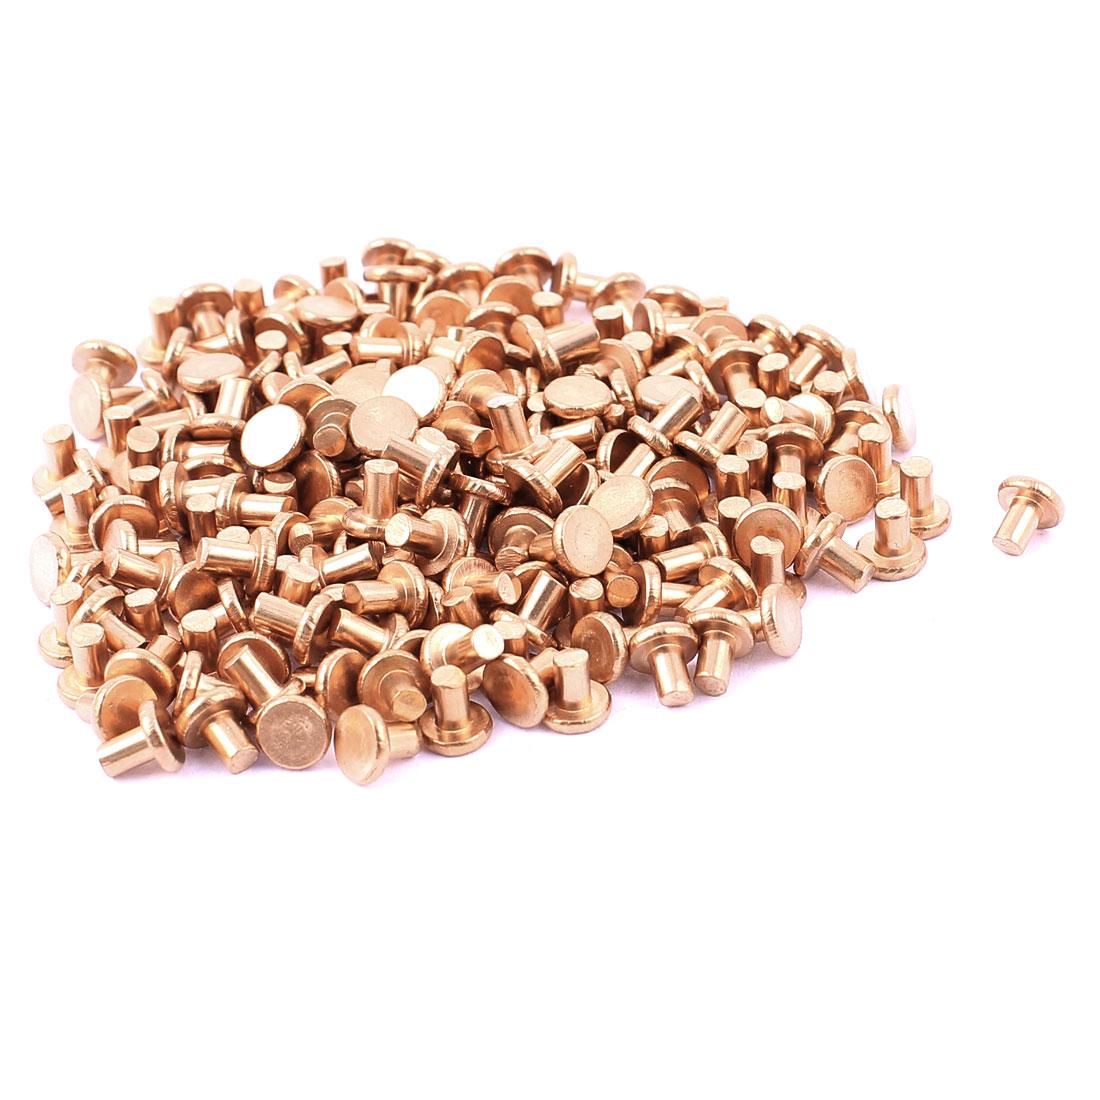 "200 Pcs 1/8"" Diameter 5/32"" Long Shank Flat Head Bolts Copper Solid Rivets Fasteners"